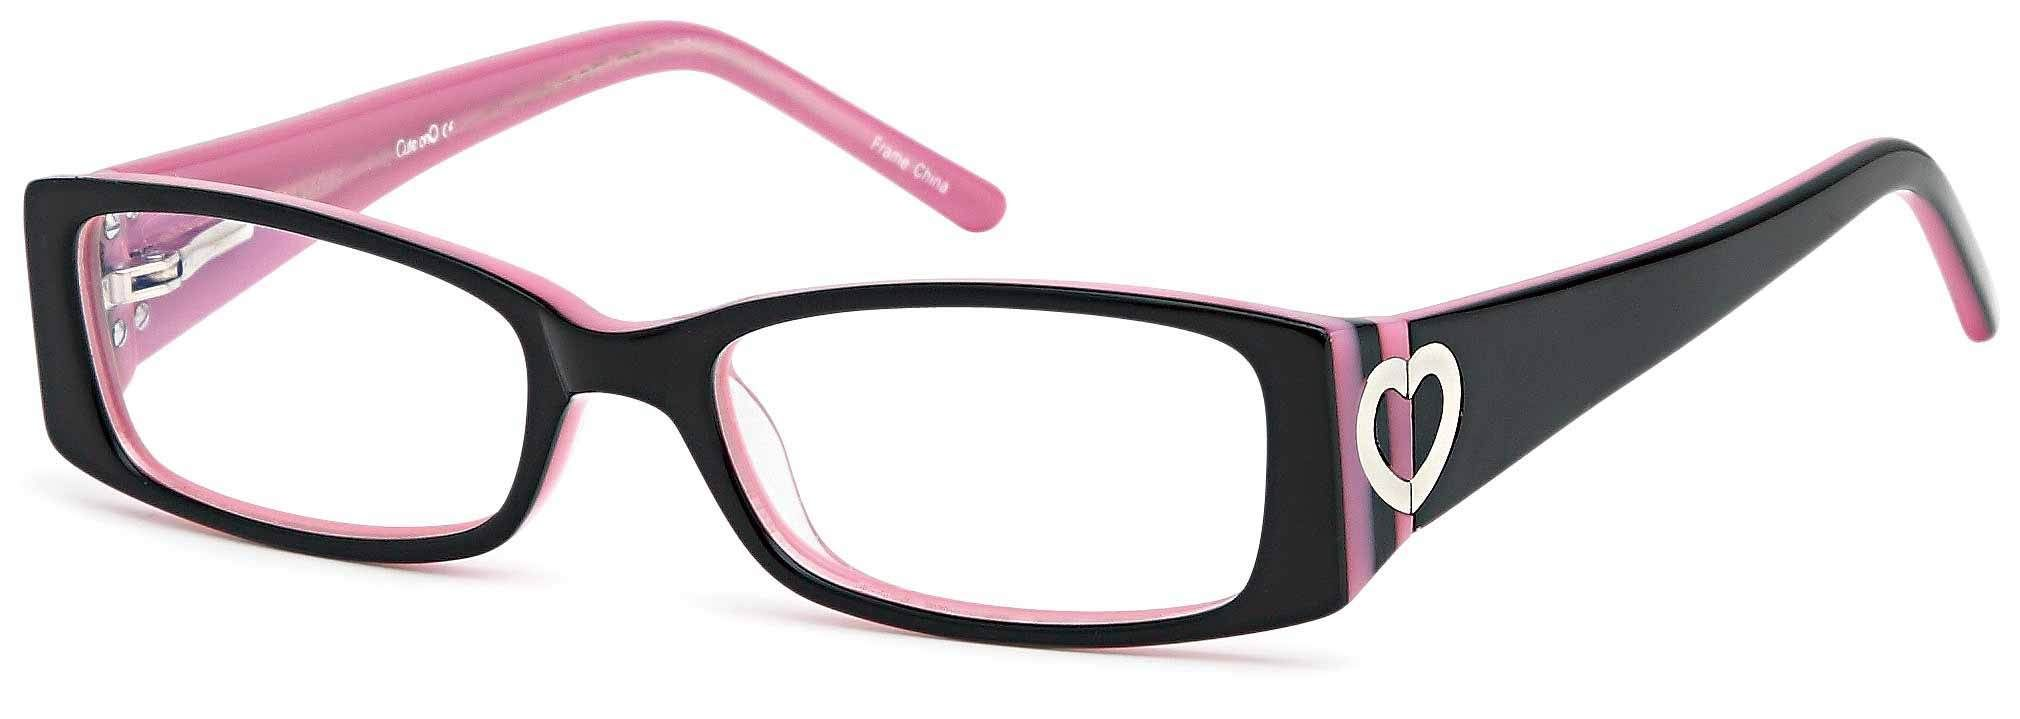 Childrens Cute Girls Hearts Glasses Frames Black Kids Prescription ...